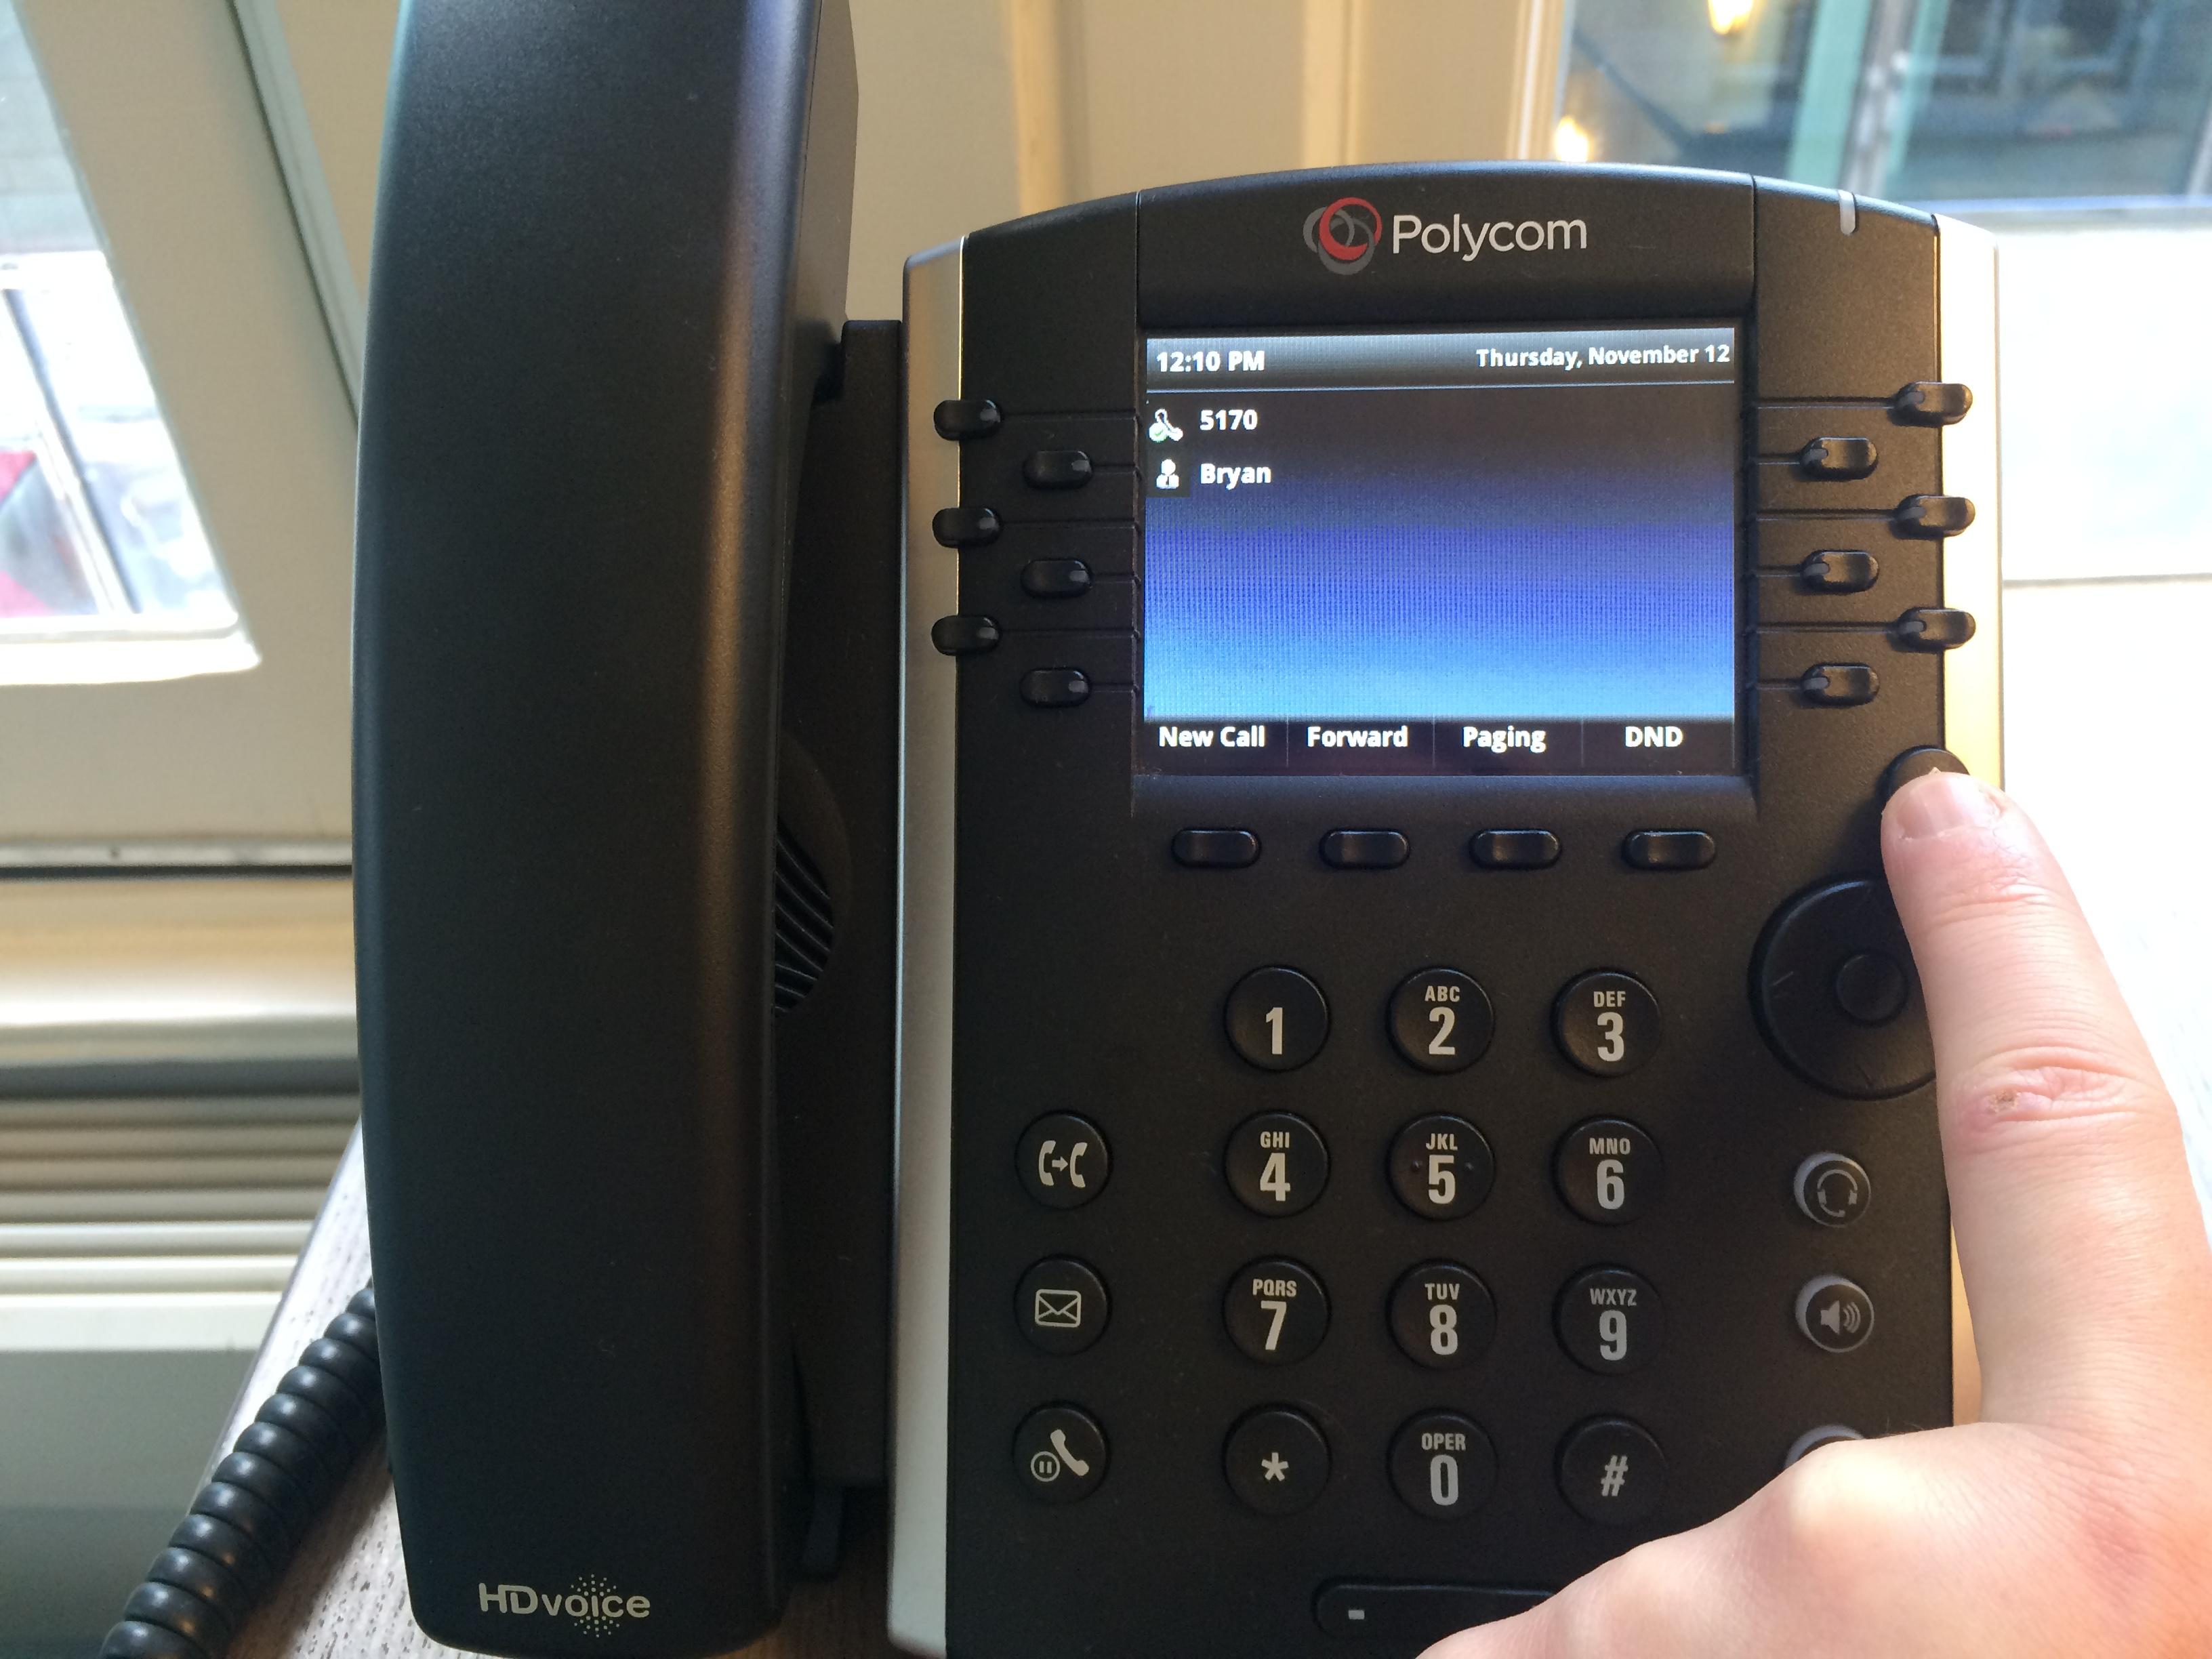 How to manually provision a Polycom a VVX 400/410 on the